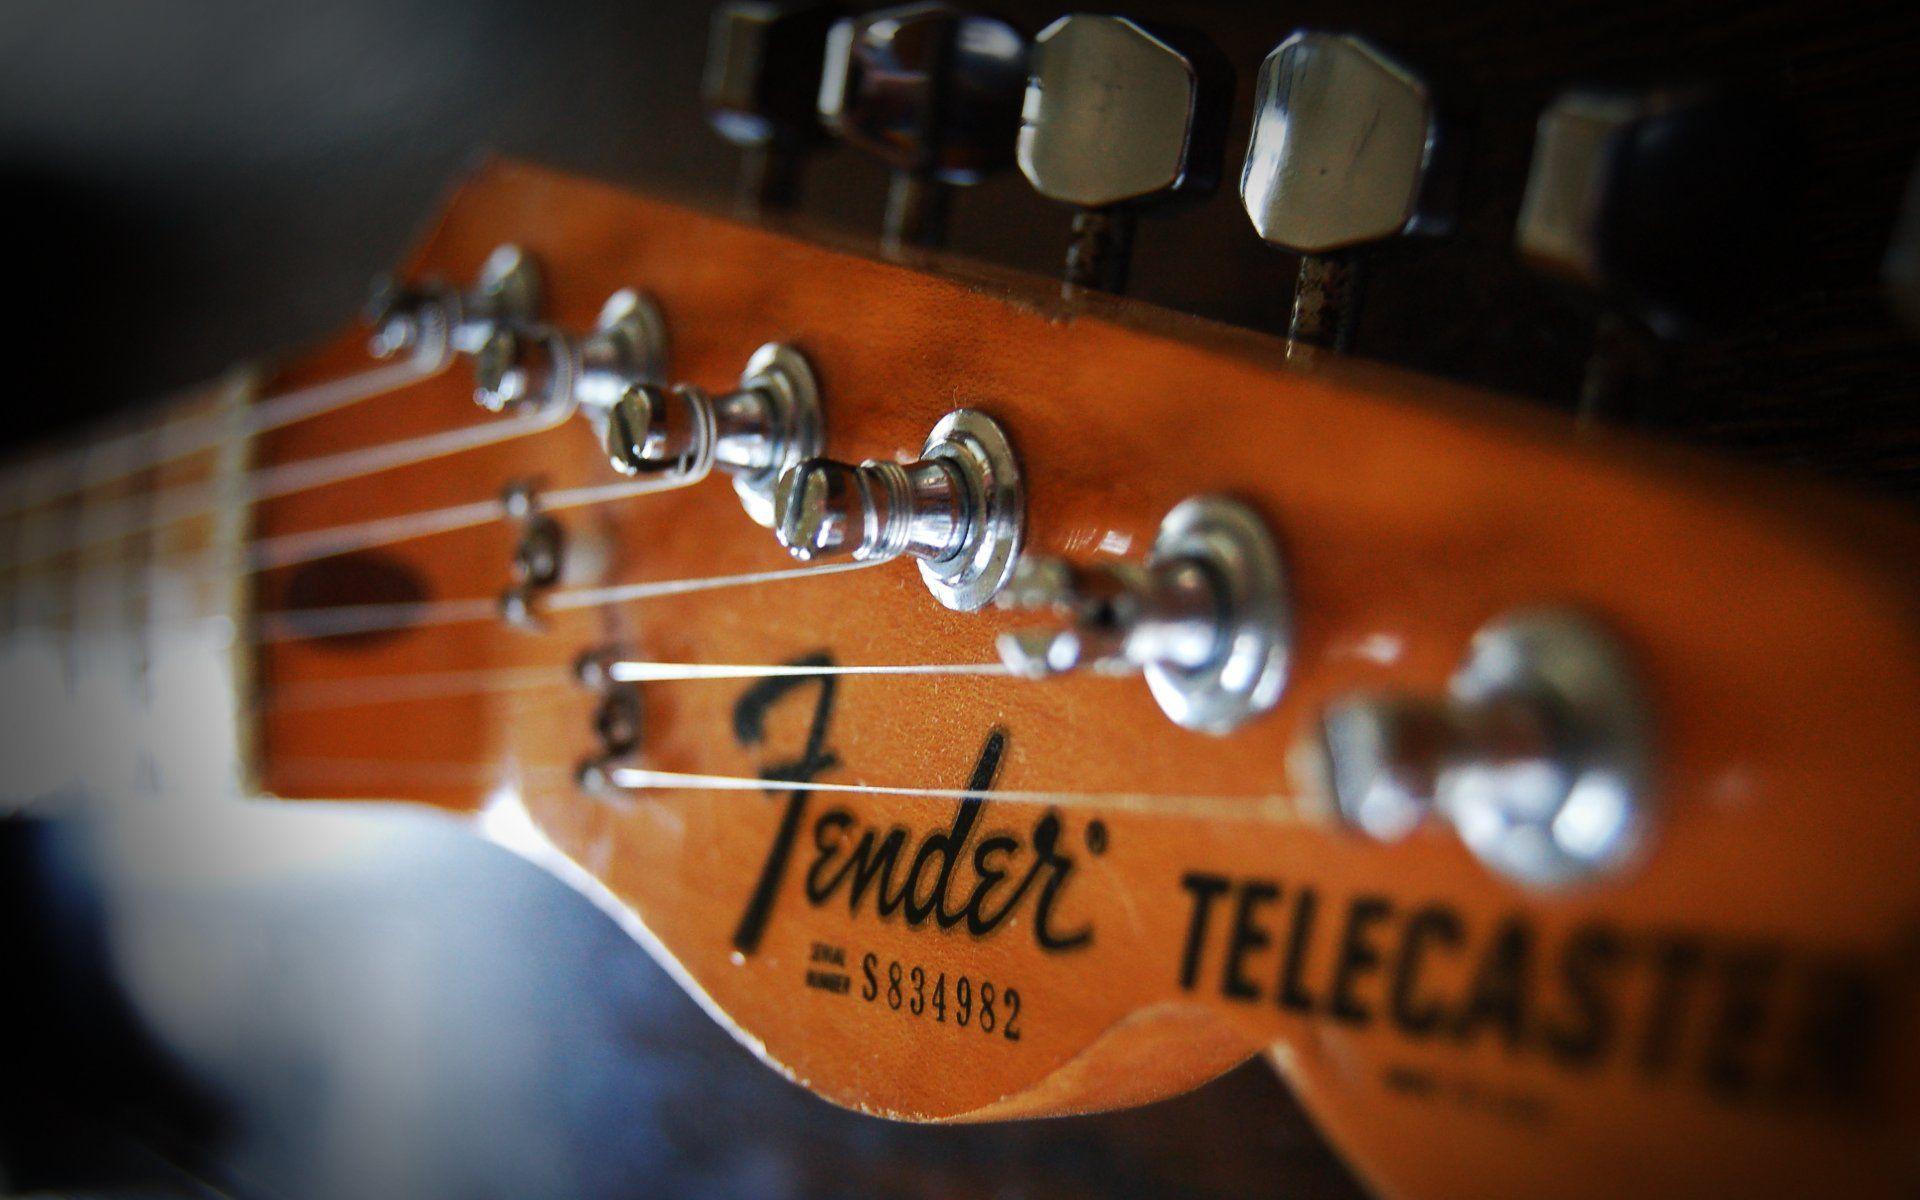 Fender Telecaster Wallpapers Wallpaper Cave